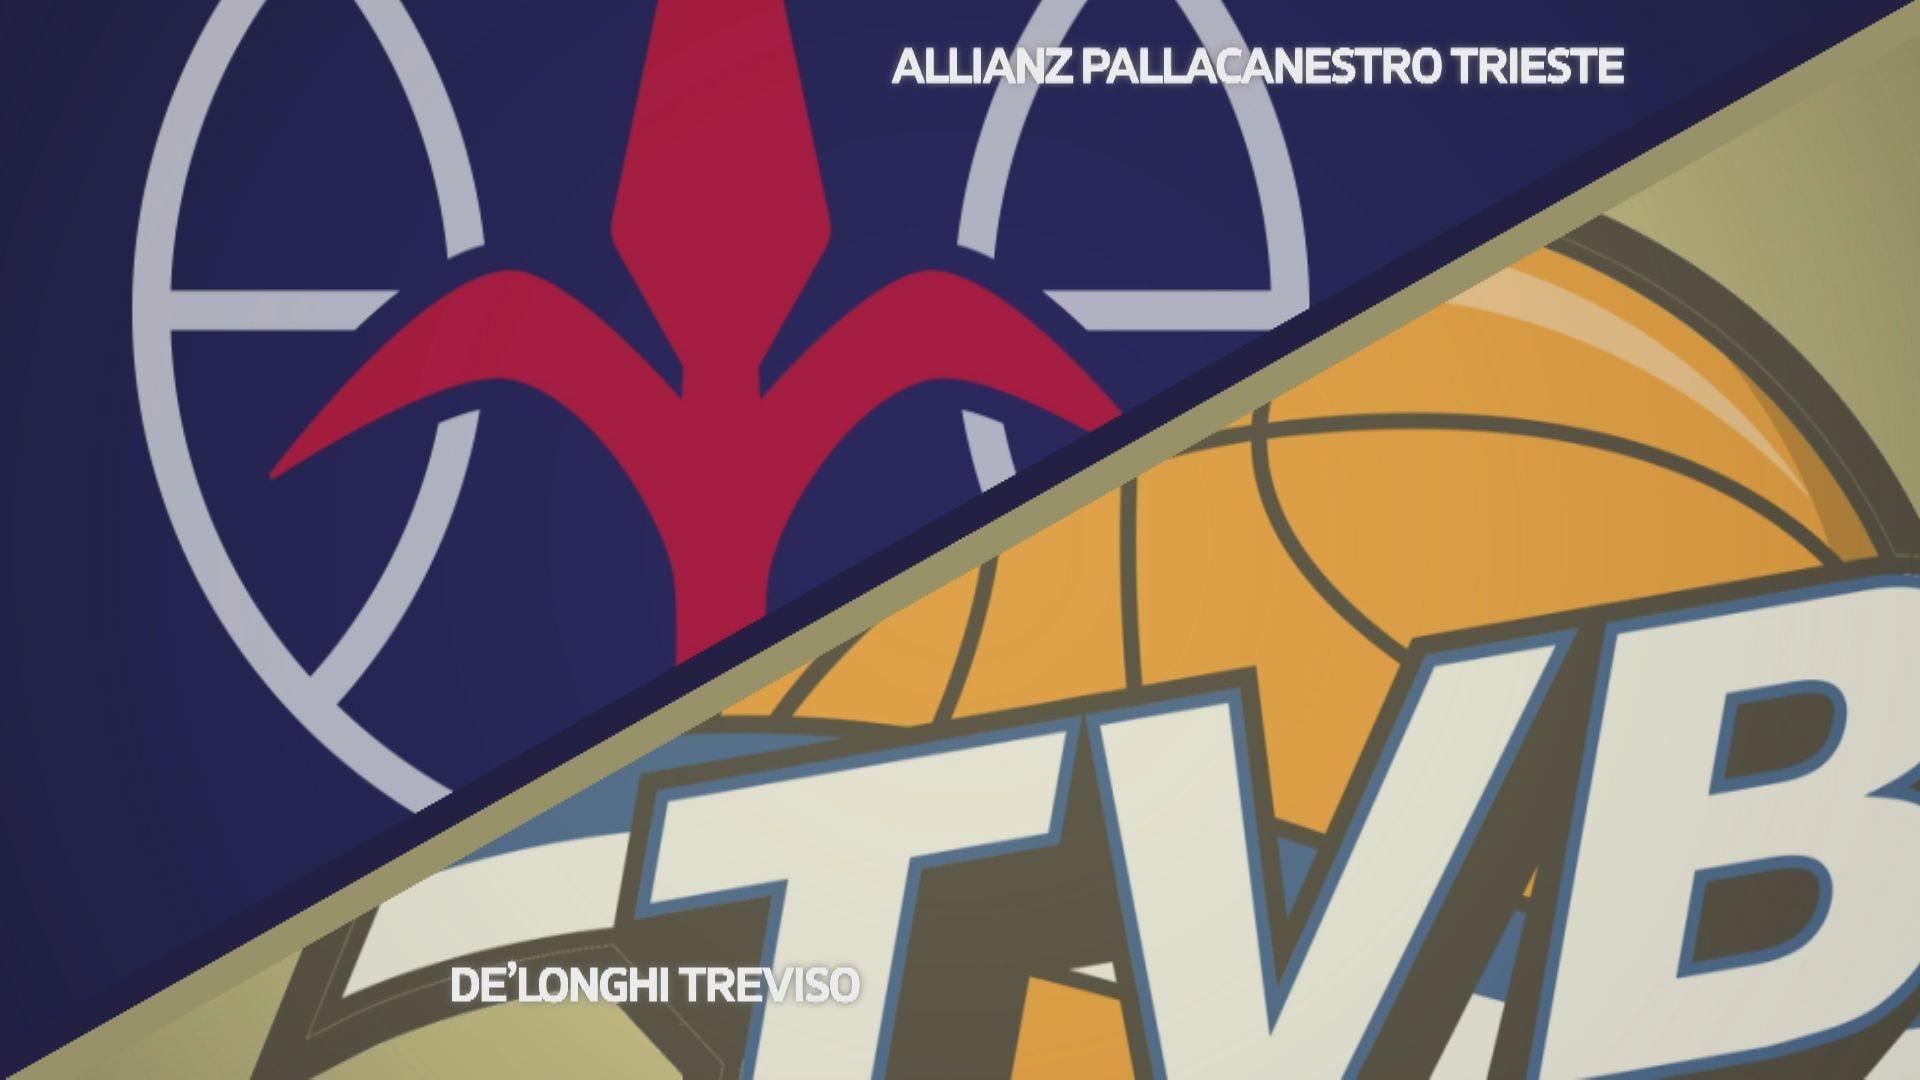 Allianz Pallacanestro Trieste - Dè Longhi Treviso 69-61